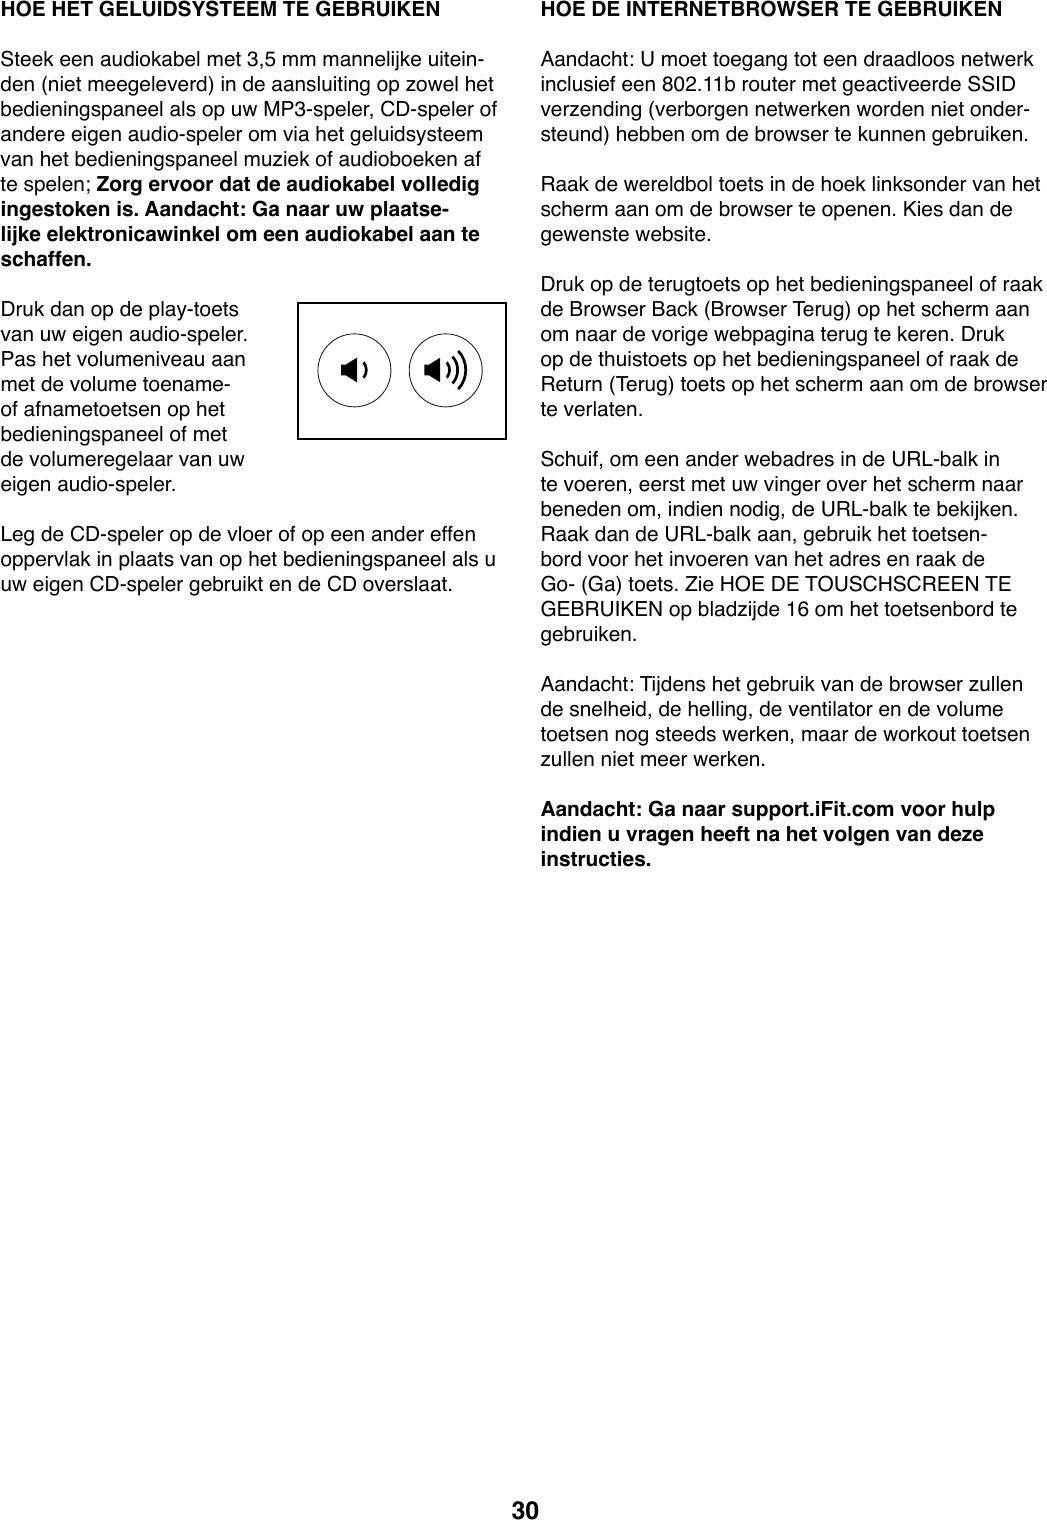 Nordic Track Netl30713 Eu0 Owner S Manual